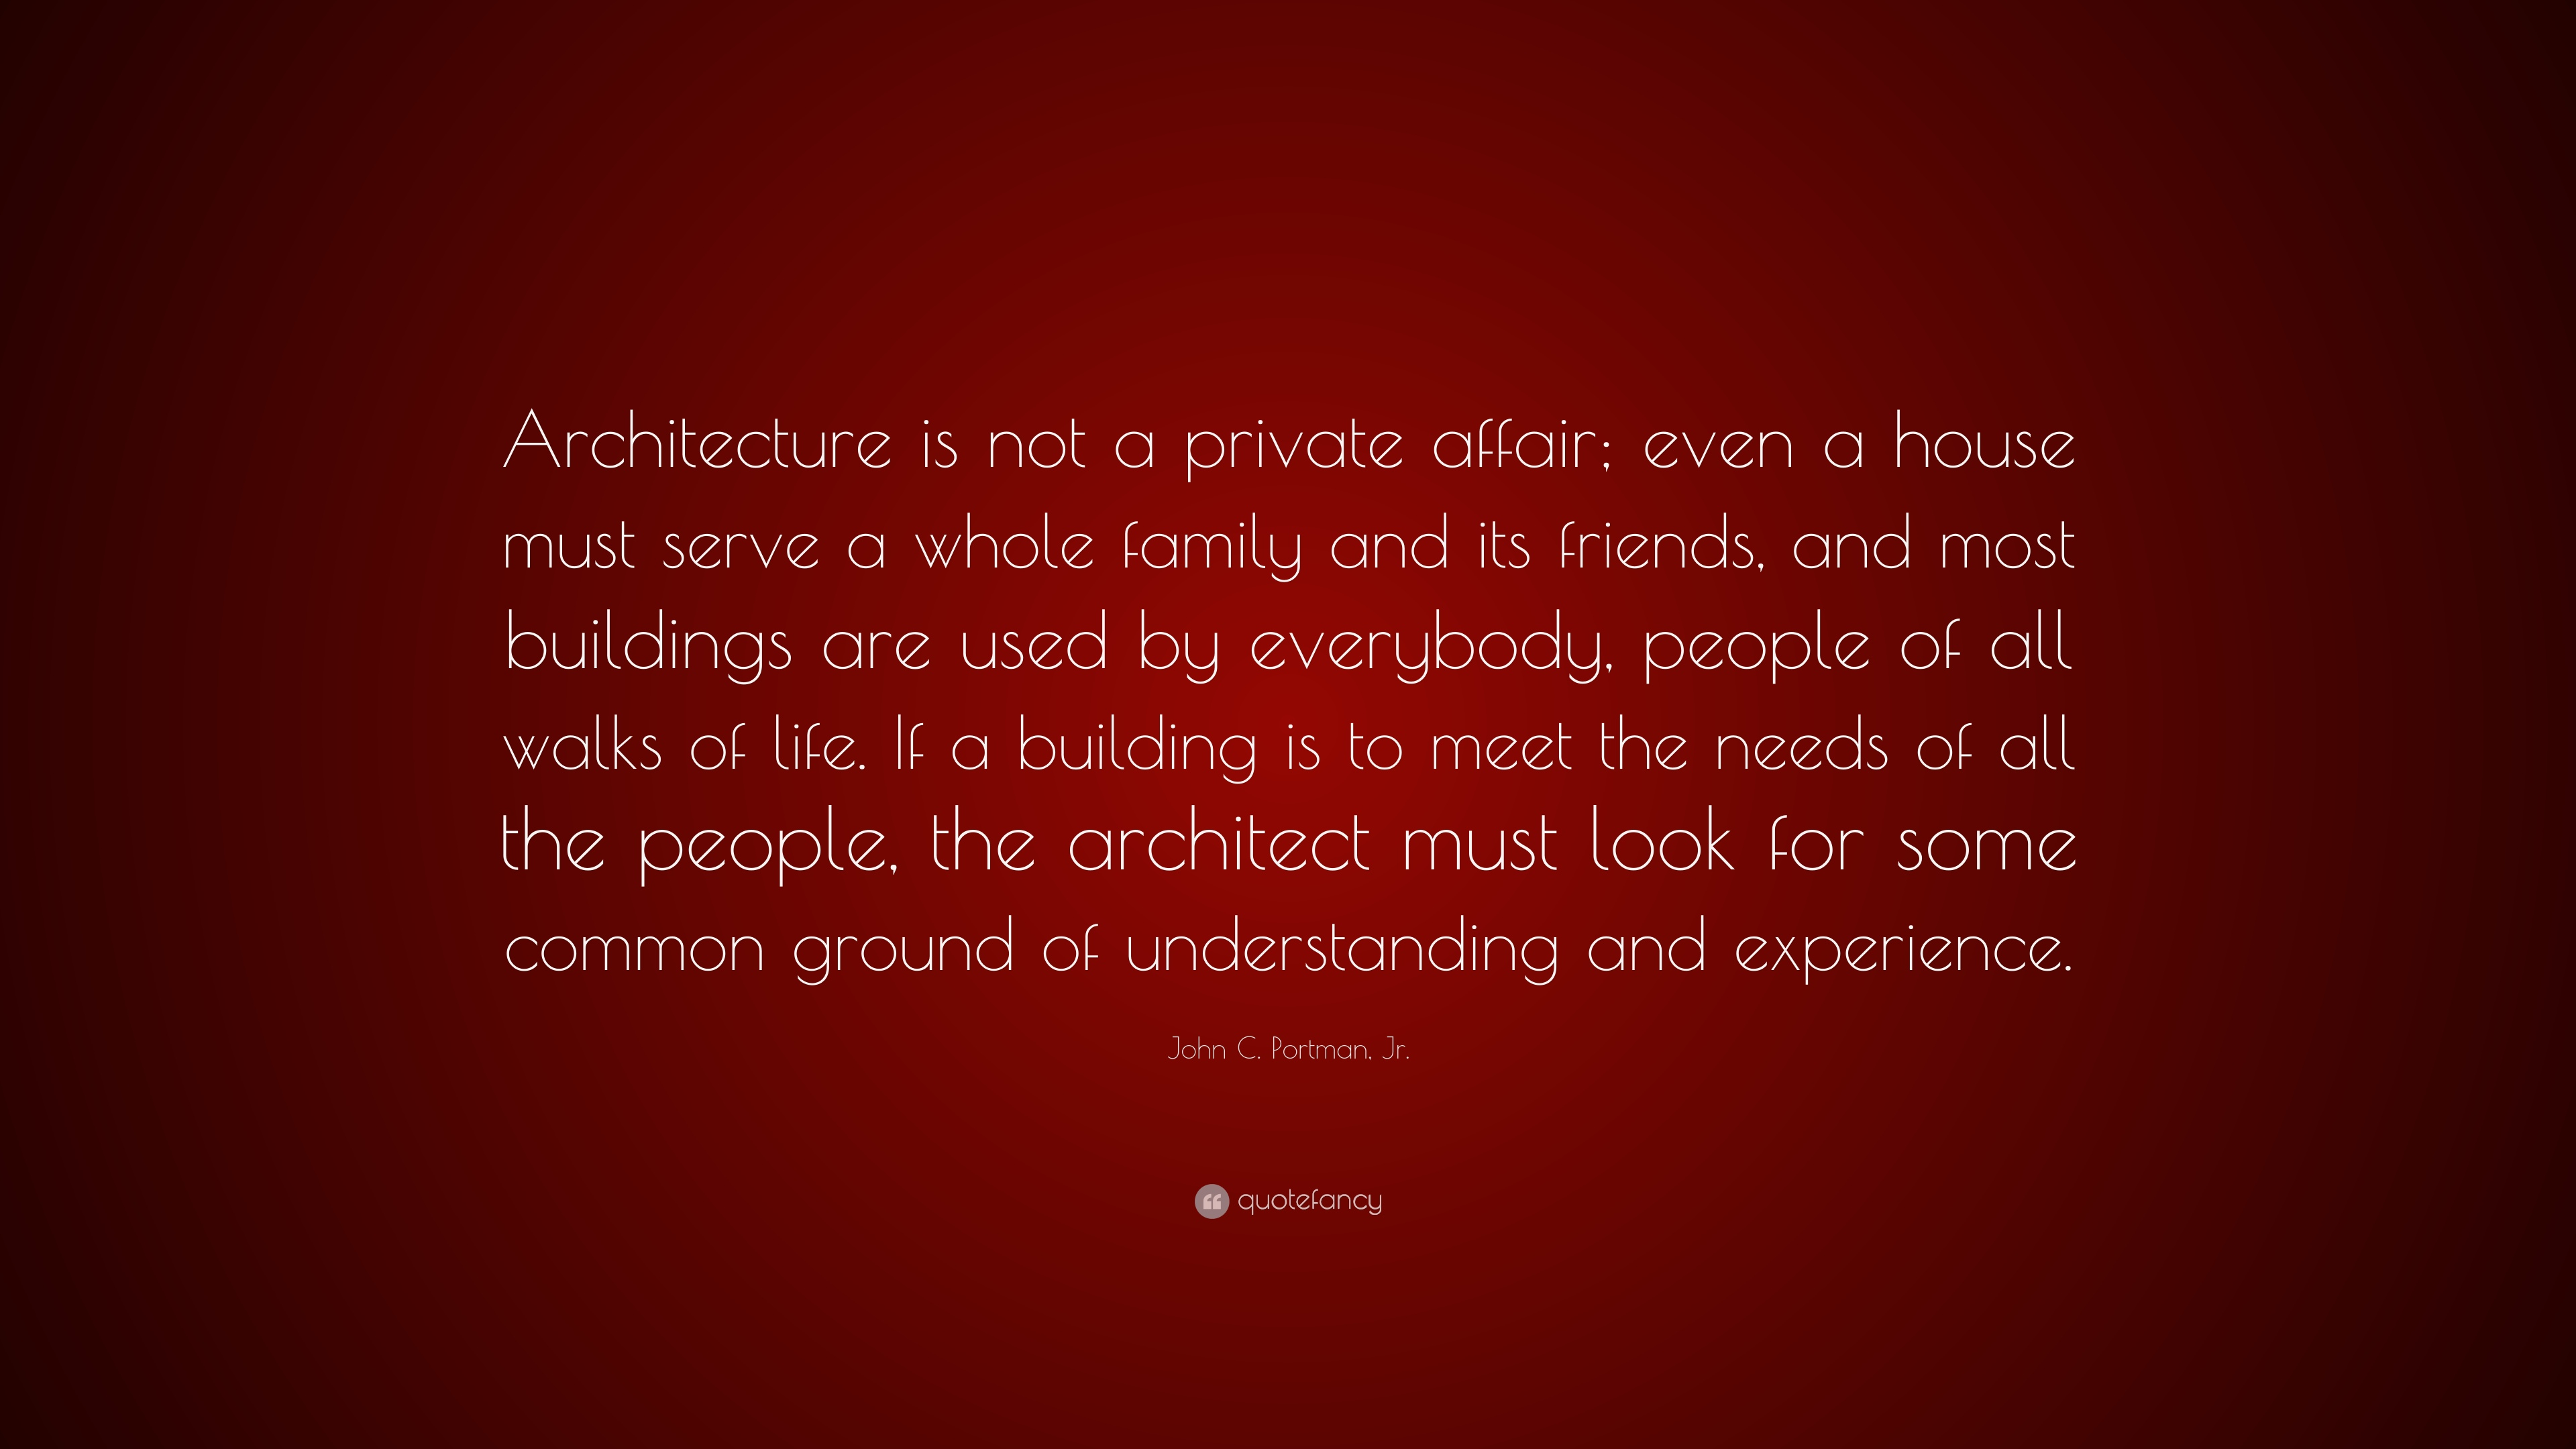 John c portman jr quotes 5 wallpapers quotefancy for House building quotes